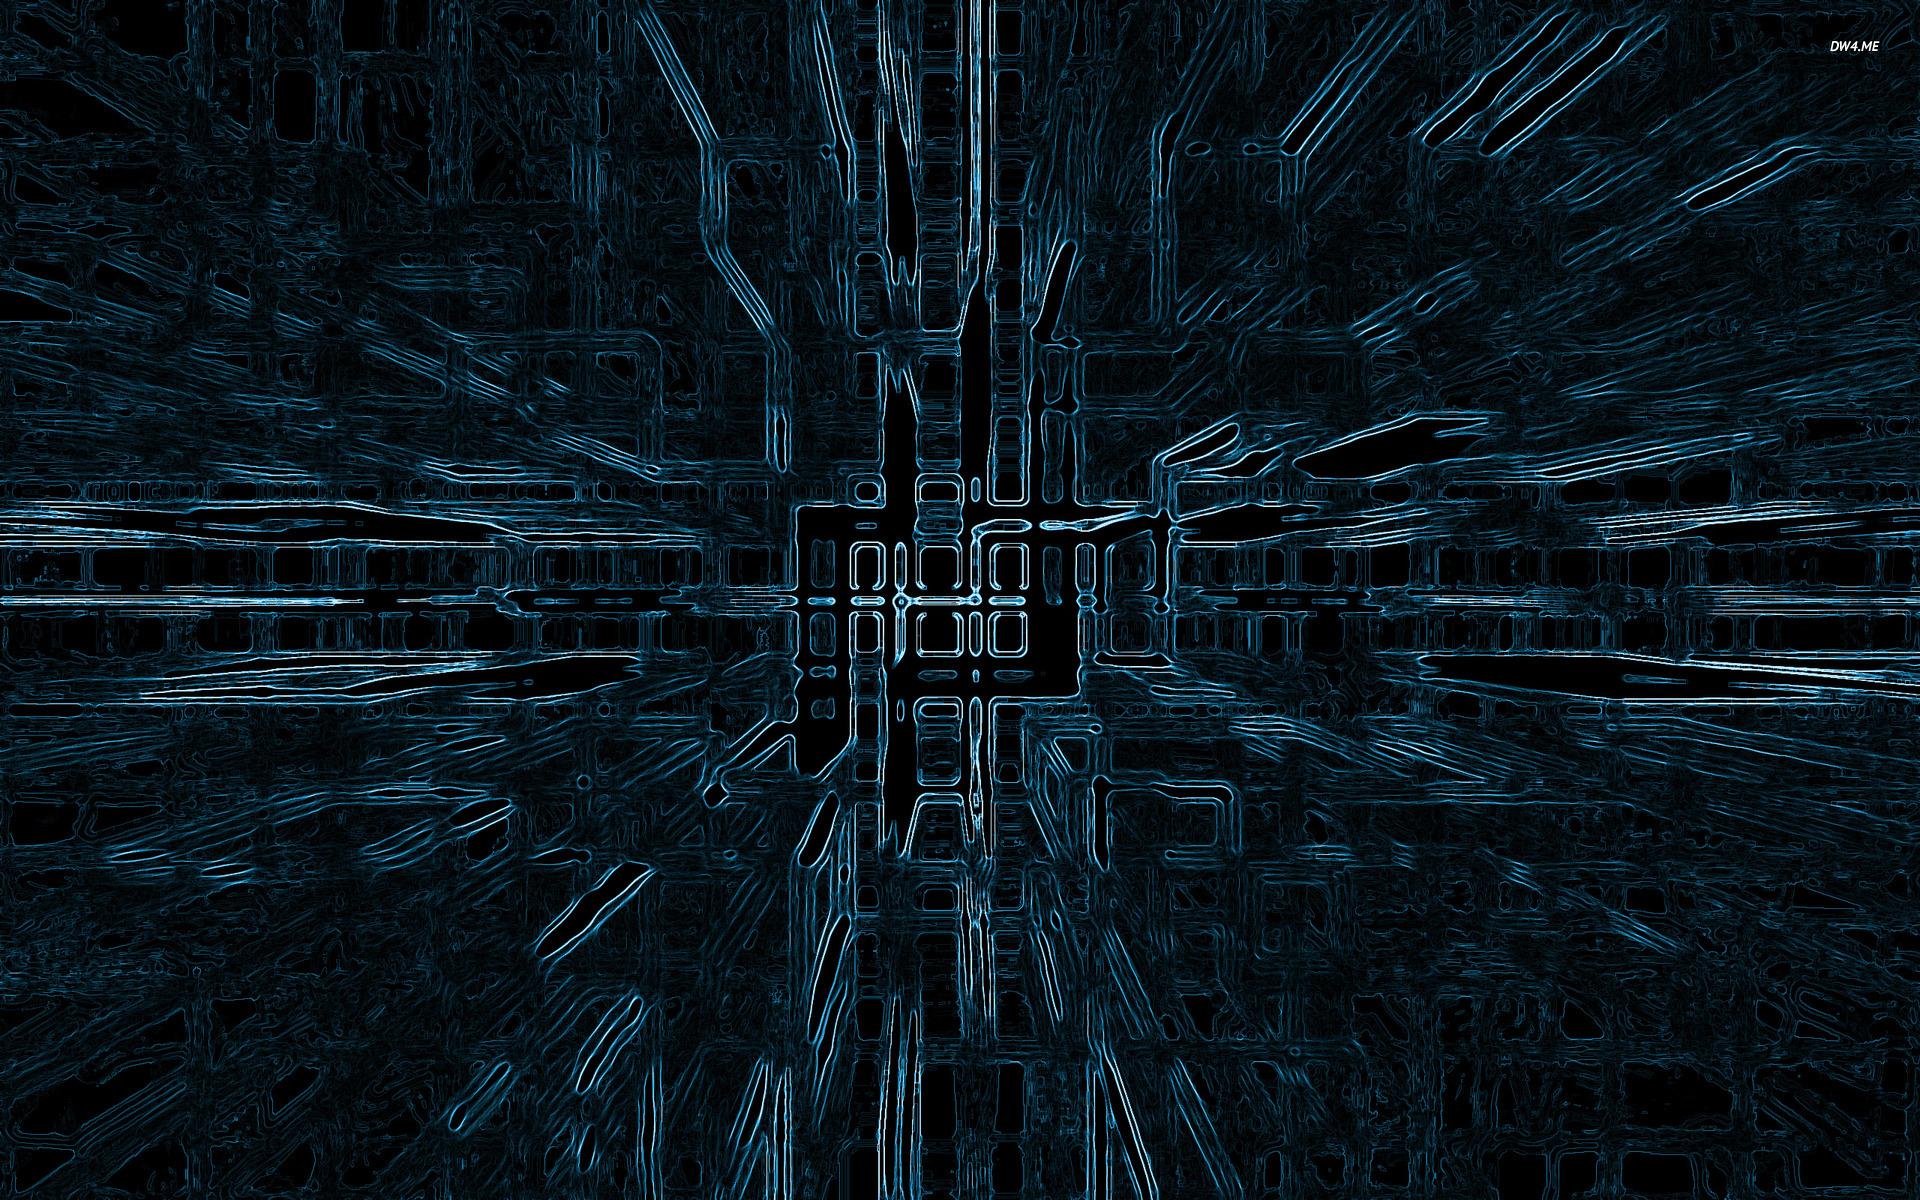 4k abstract wallpaper - sf wallpaper